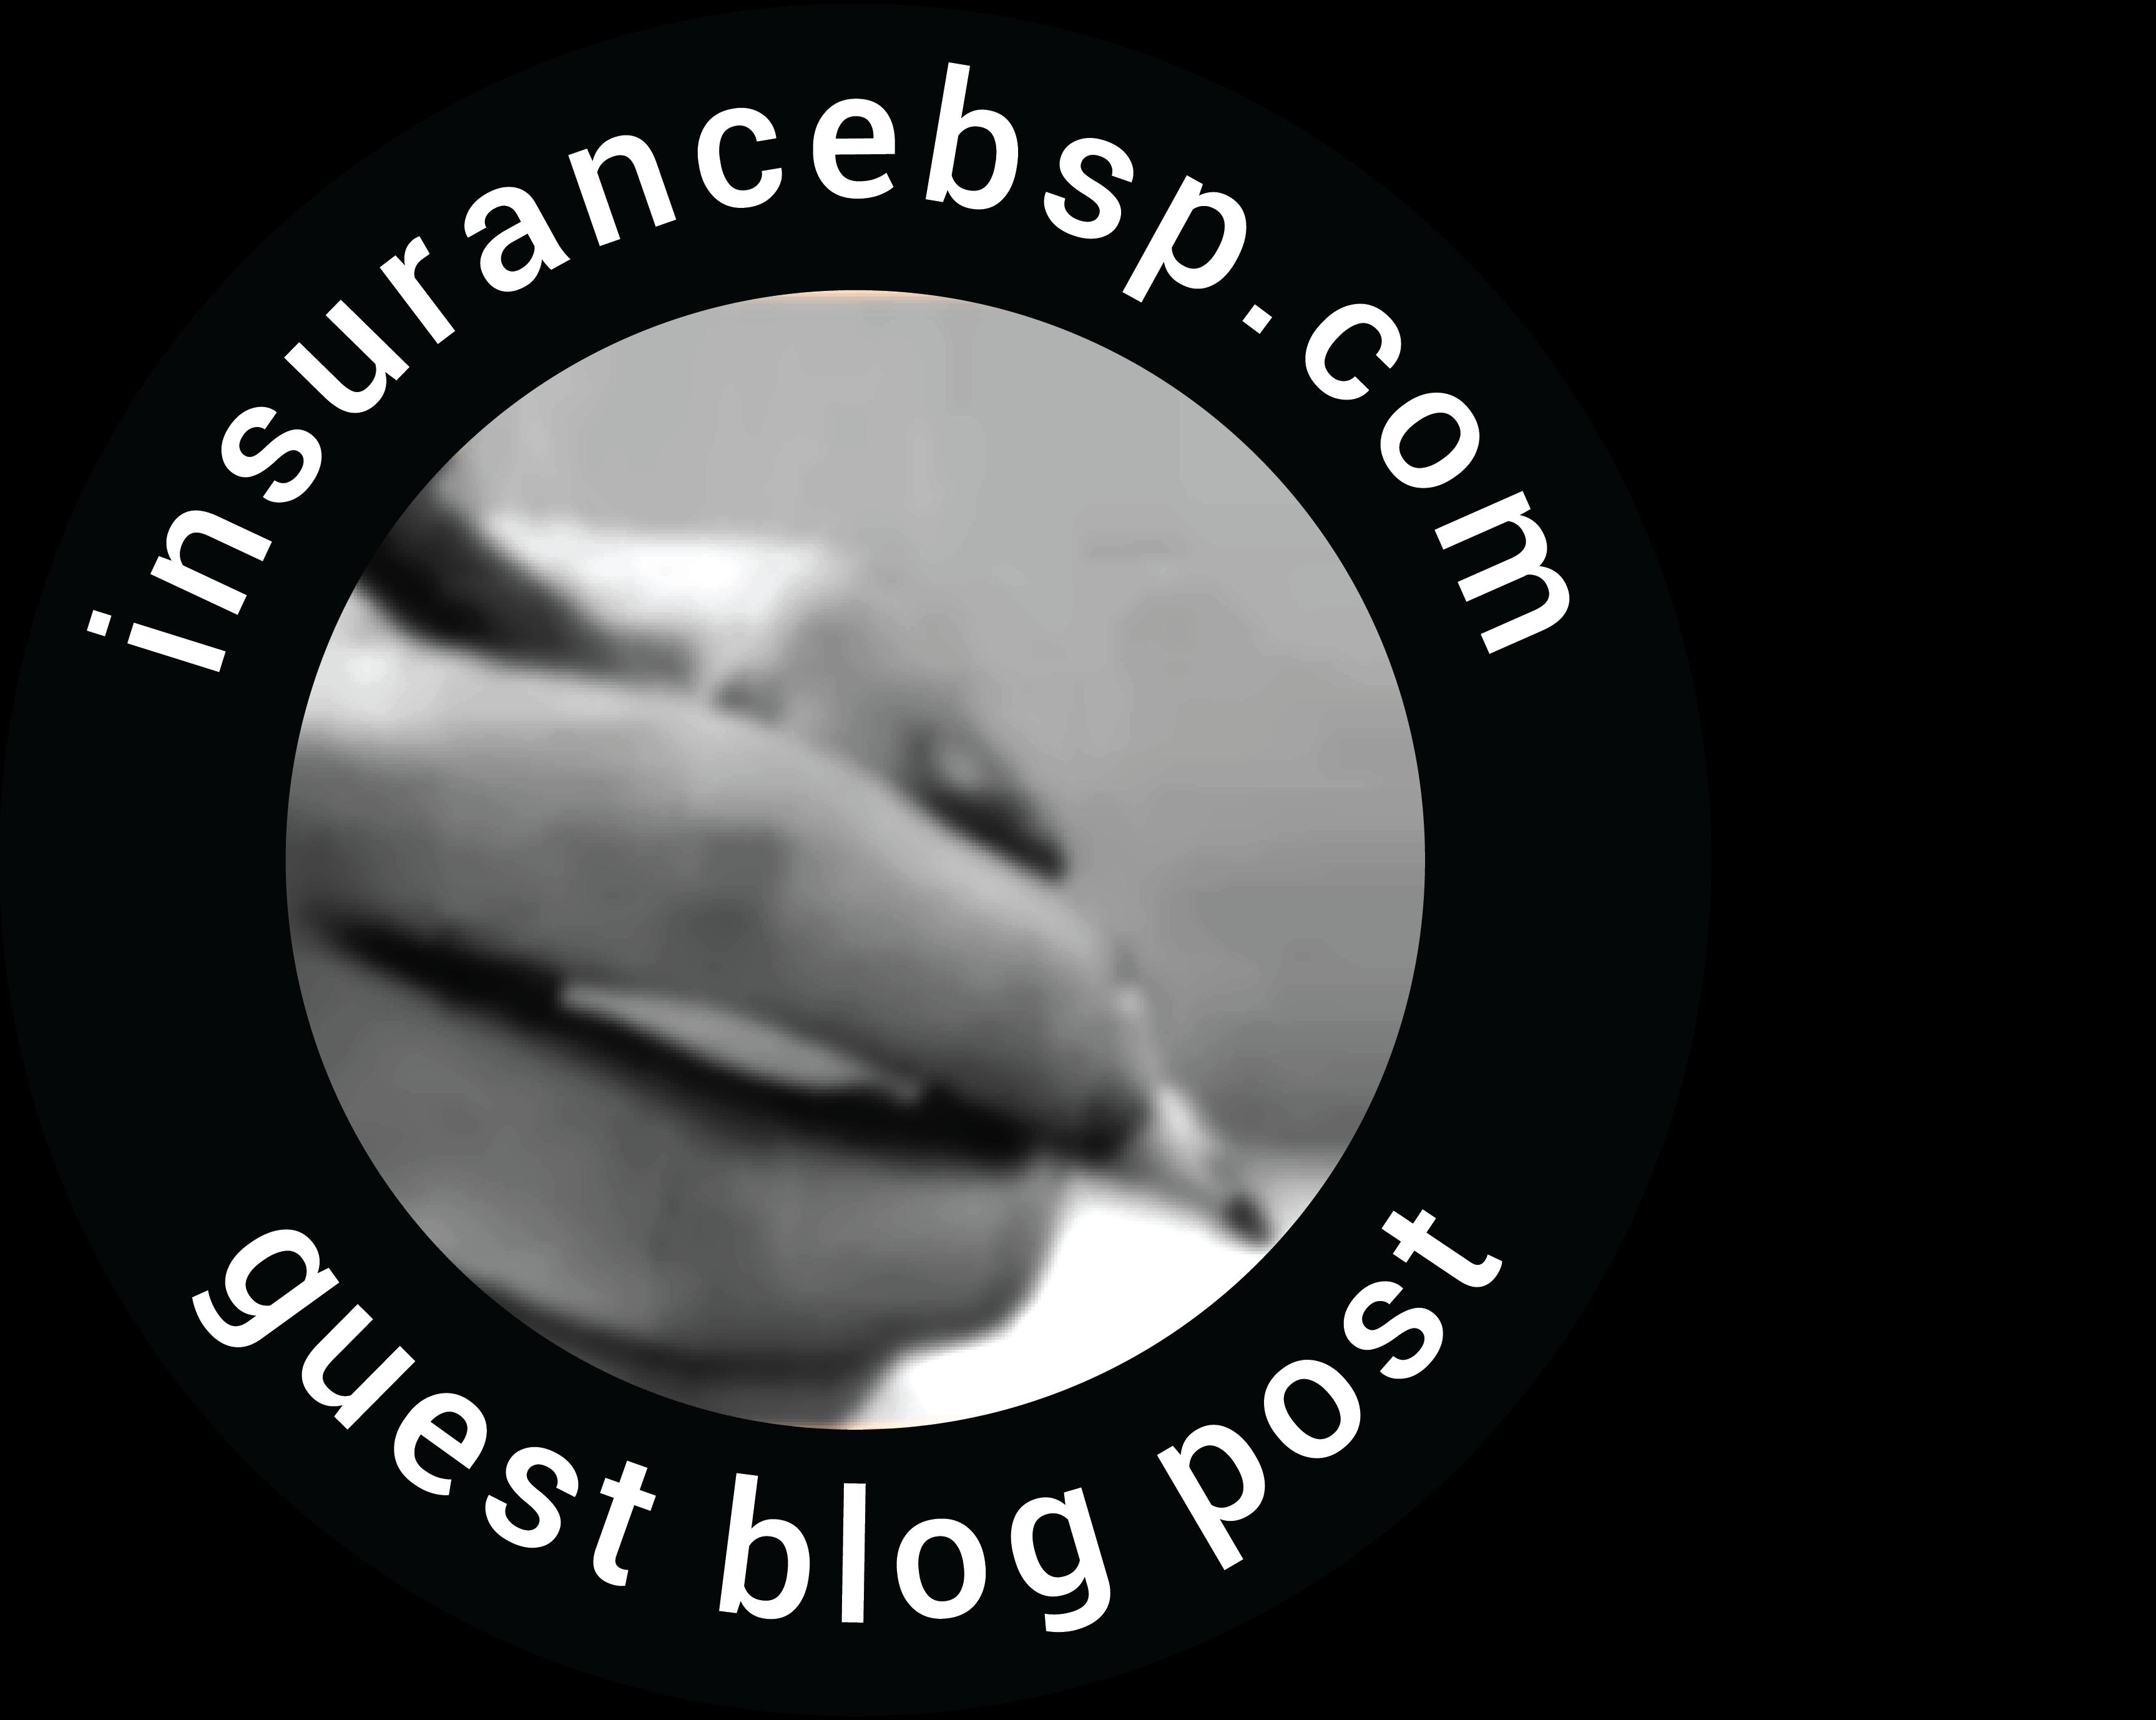 InsuranceBsp